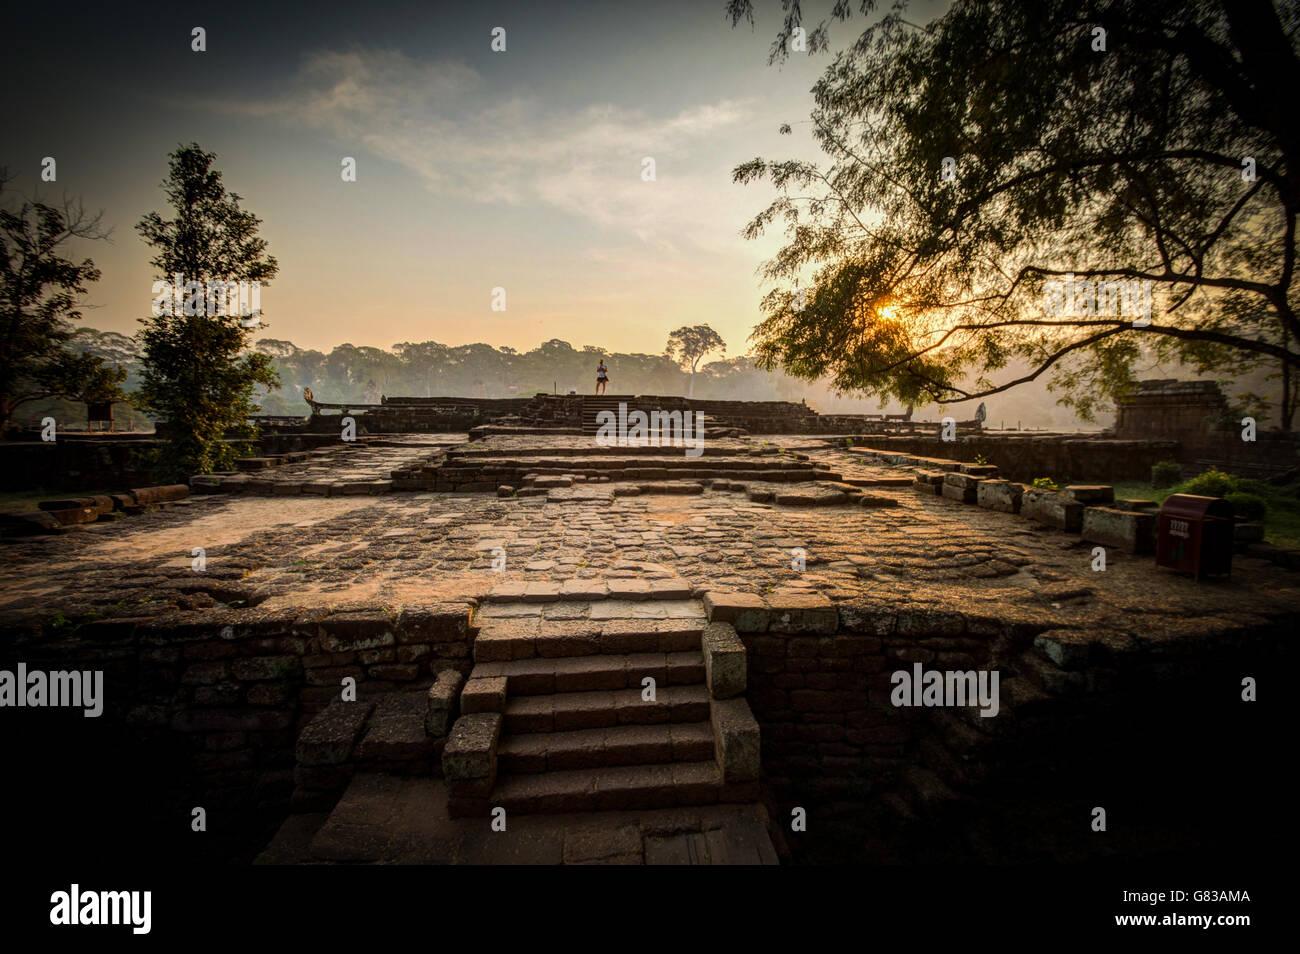 Angkor Wat temple, Siem Reap, Cambodia Hinduism Khmer culture buildings - Stock Image